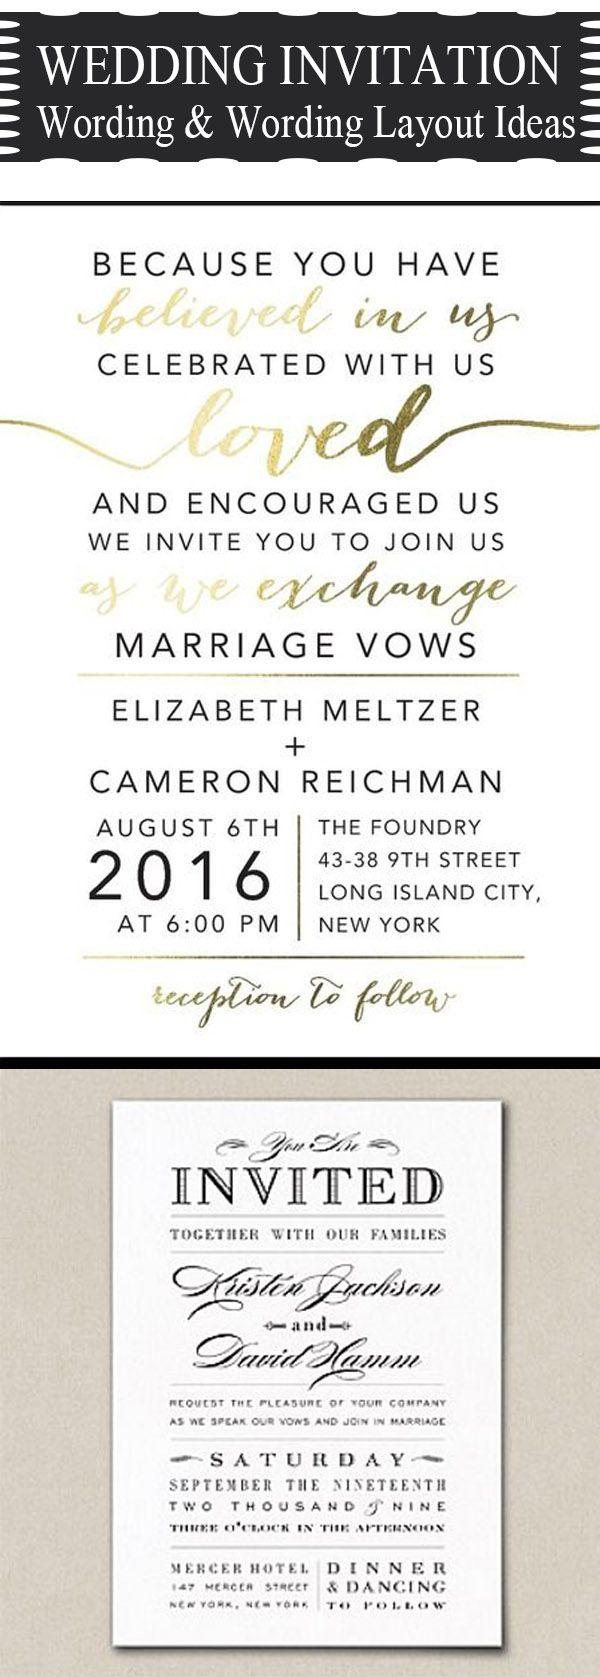 wedding invitation wording wedding invitations wording 20 Popular Wedding Invitation Wording DIY Templates Ideas